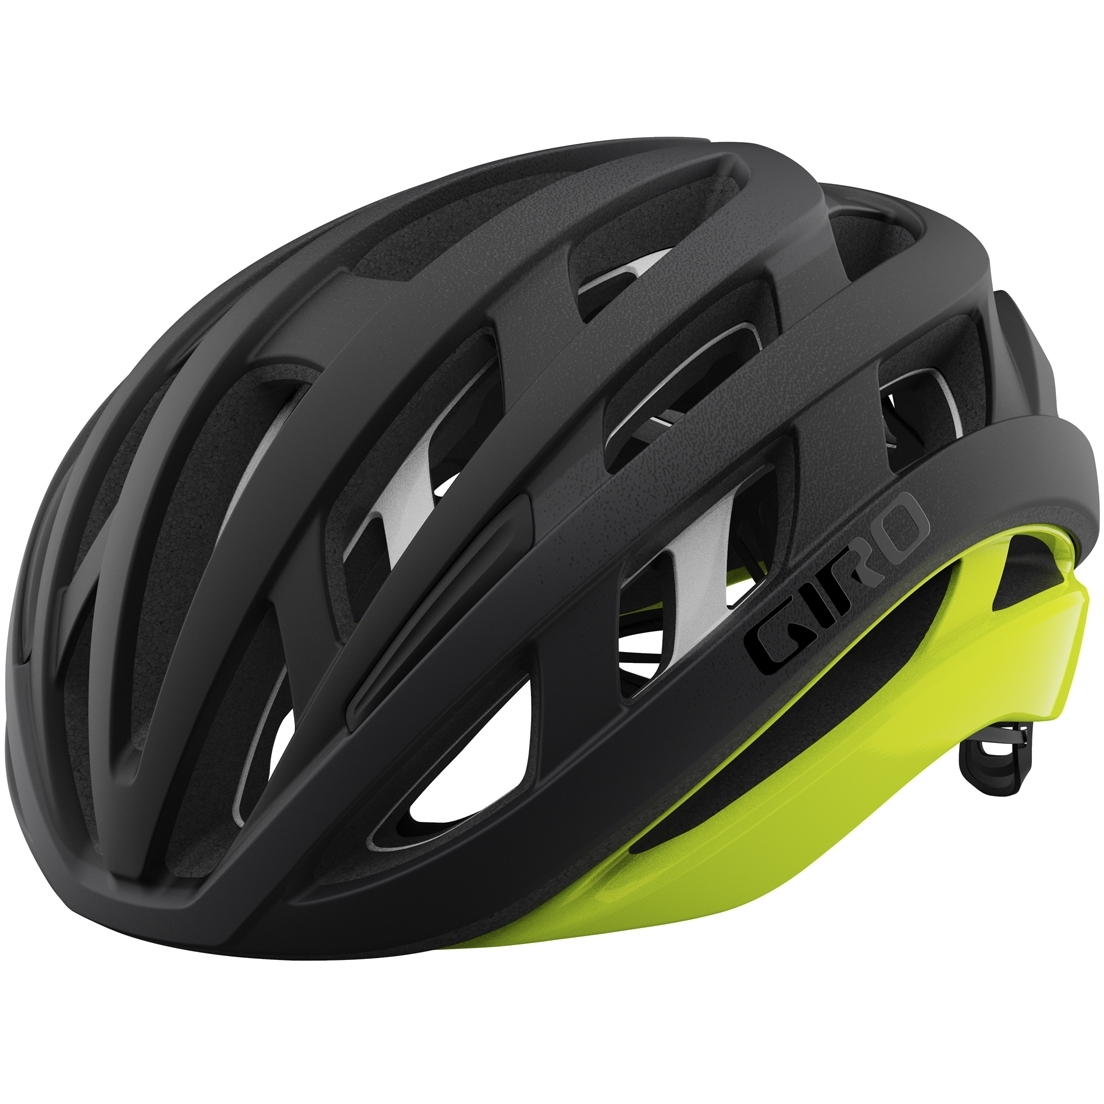 Giro Helios Spherical MIPS Helm - matte black fade / highlight yellow